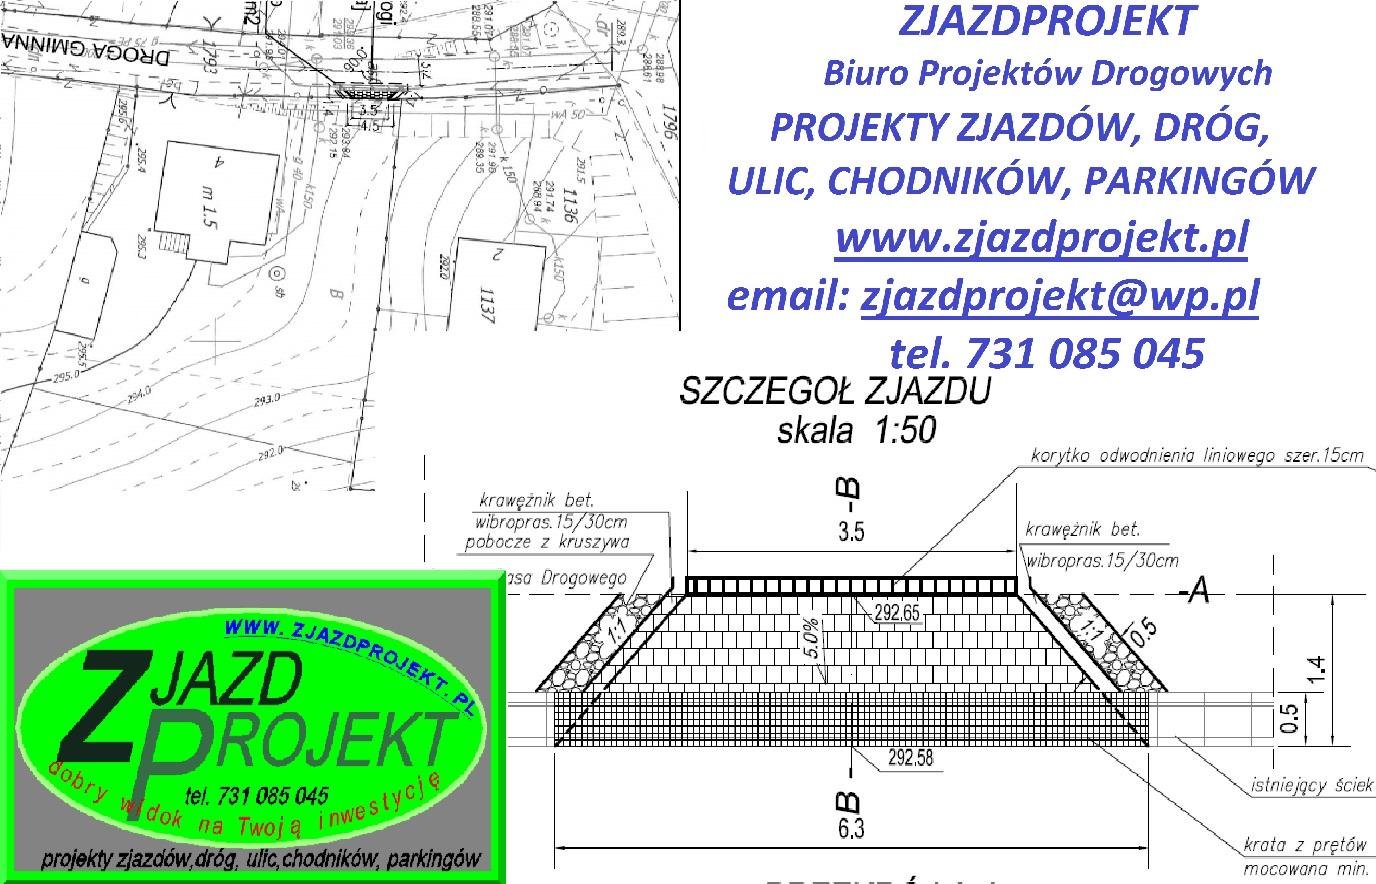 Góra Projekt zjazdu z drogi - ZJAZDPROJEKT-projekty drogi, chodnika  RT-35